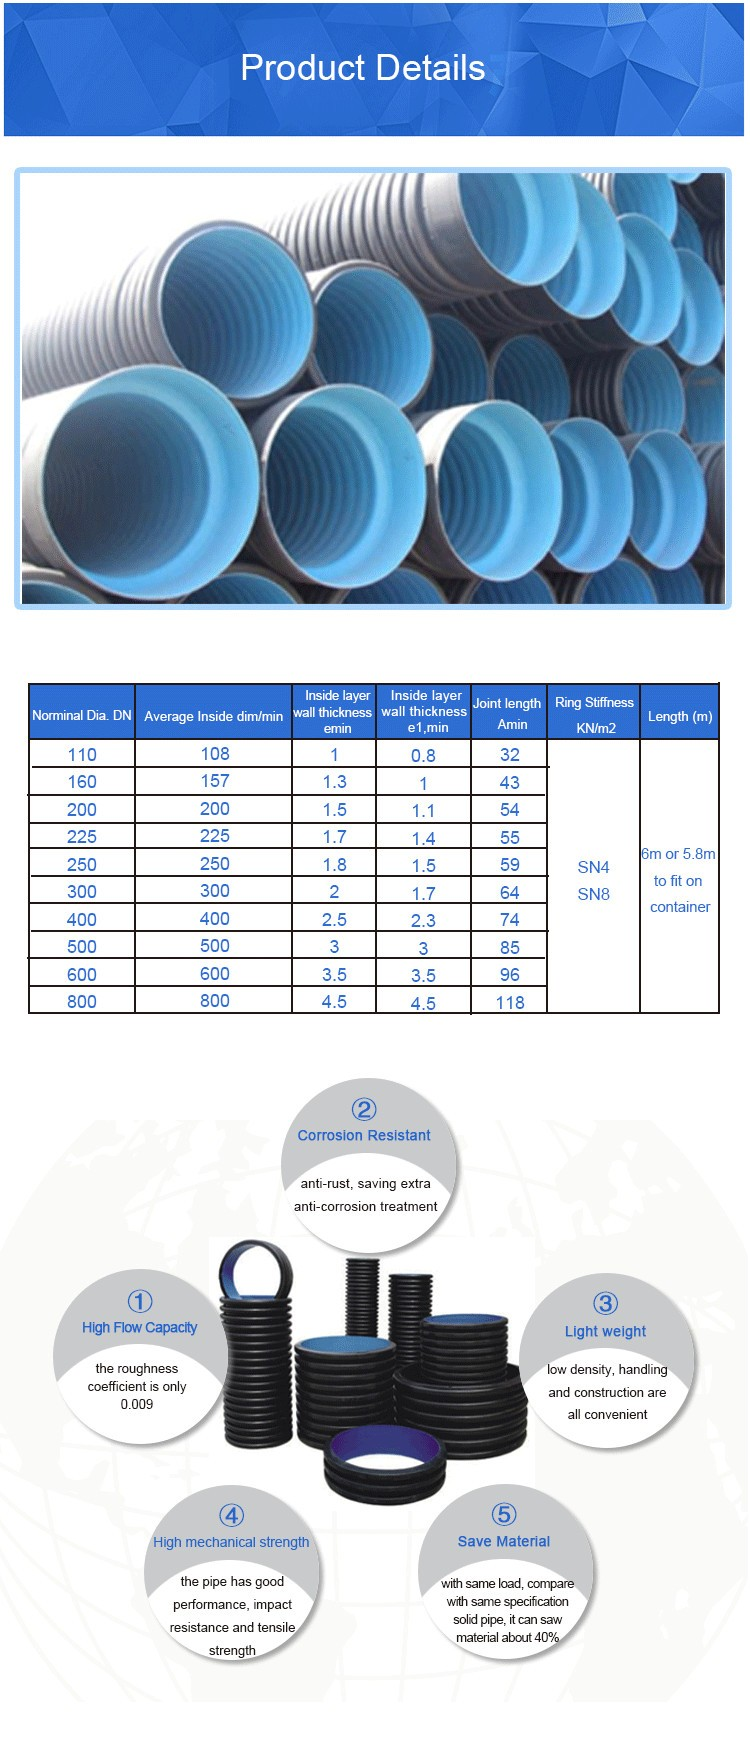 Underground drainage plastic culvert mm pipe sizes